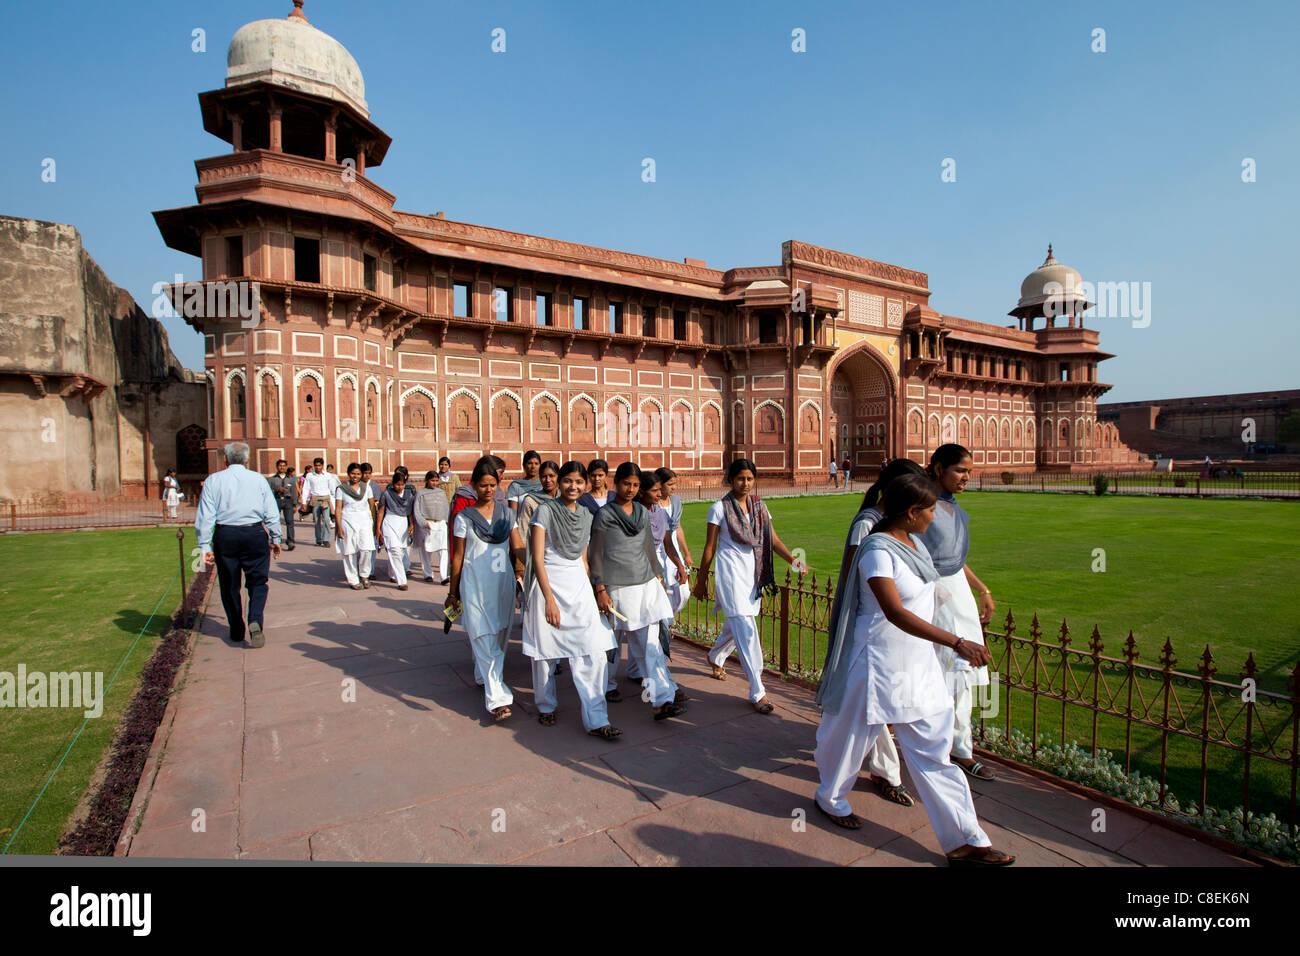 Touristen in Agra Fort Jahangir Mahal, Ehefrauen Zenana Residenz der Rajput von Mughal Kaiser Akbar Stockbild